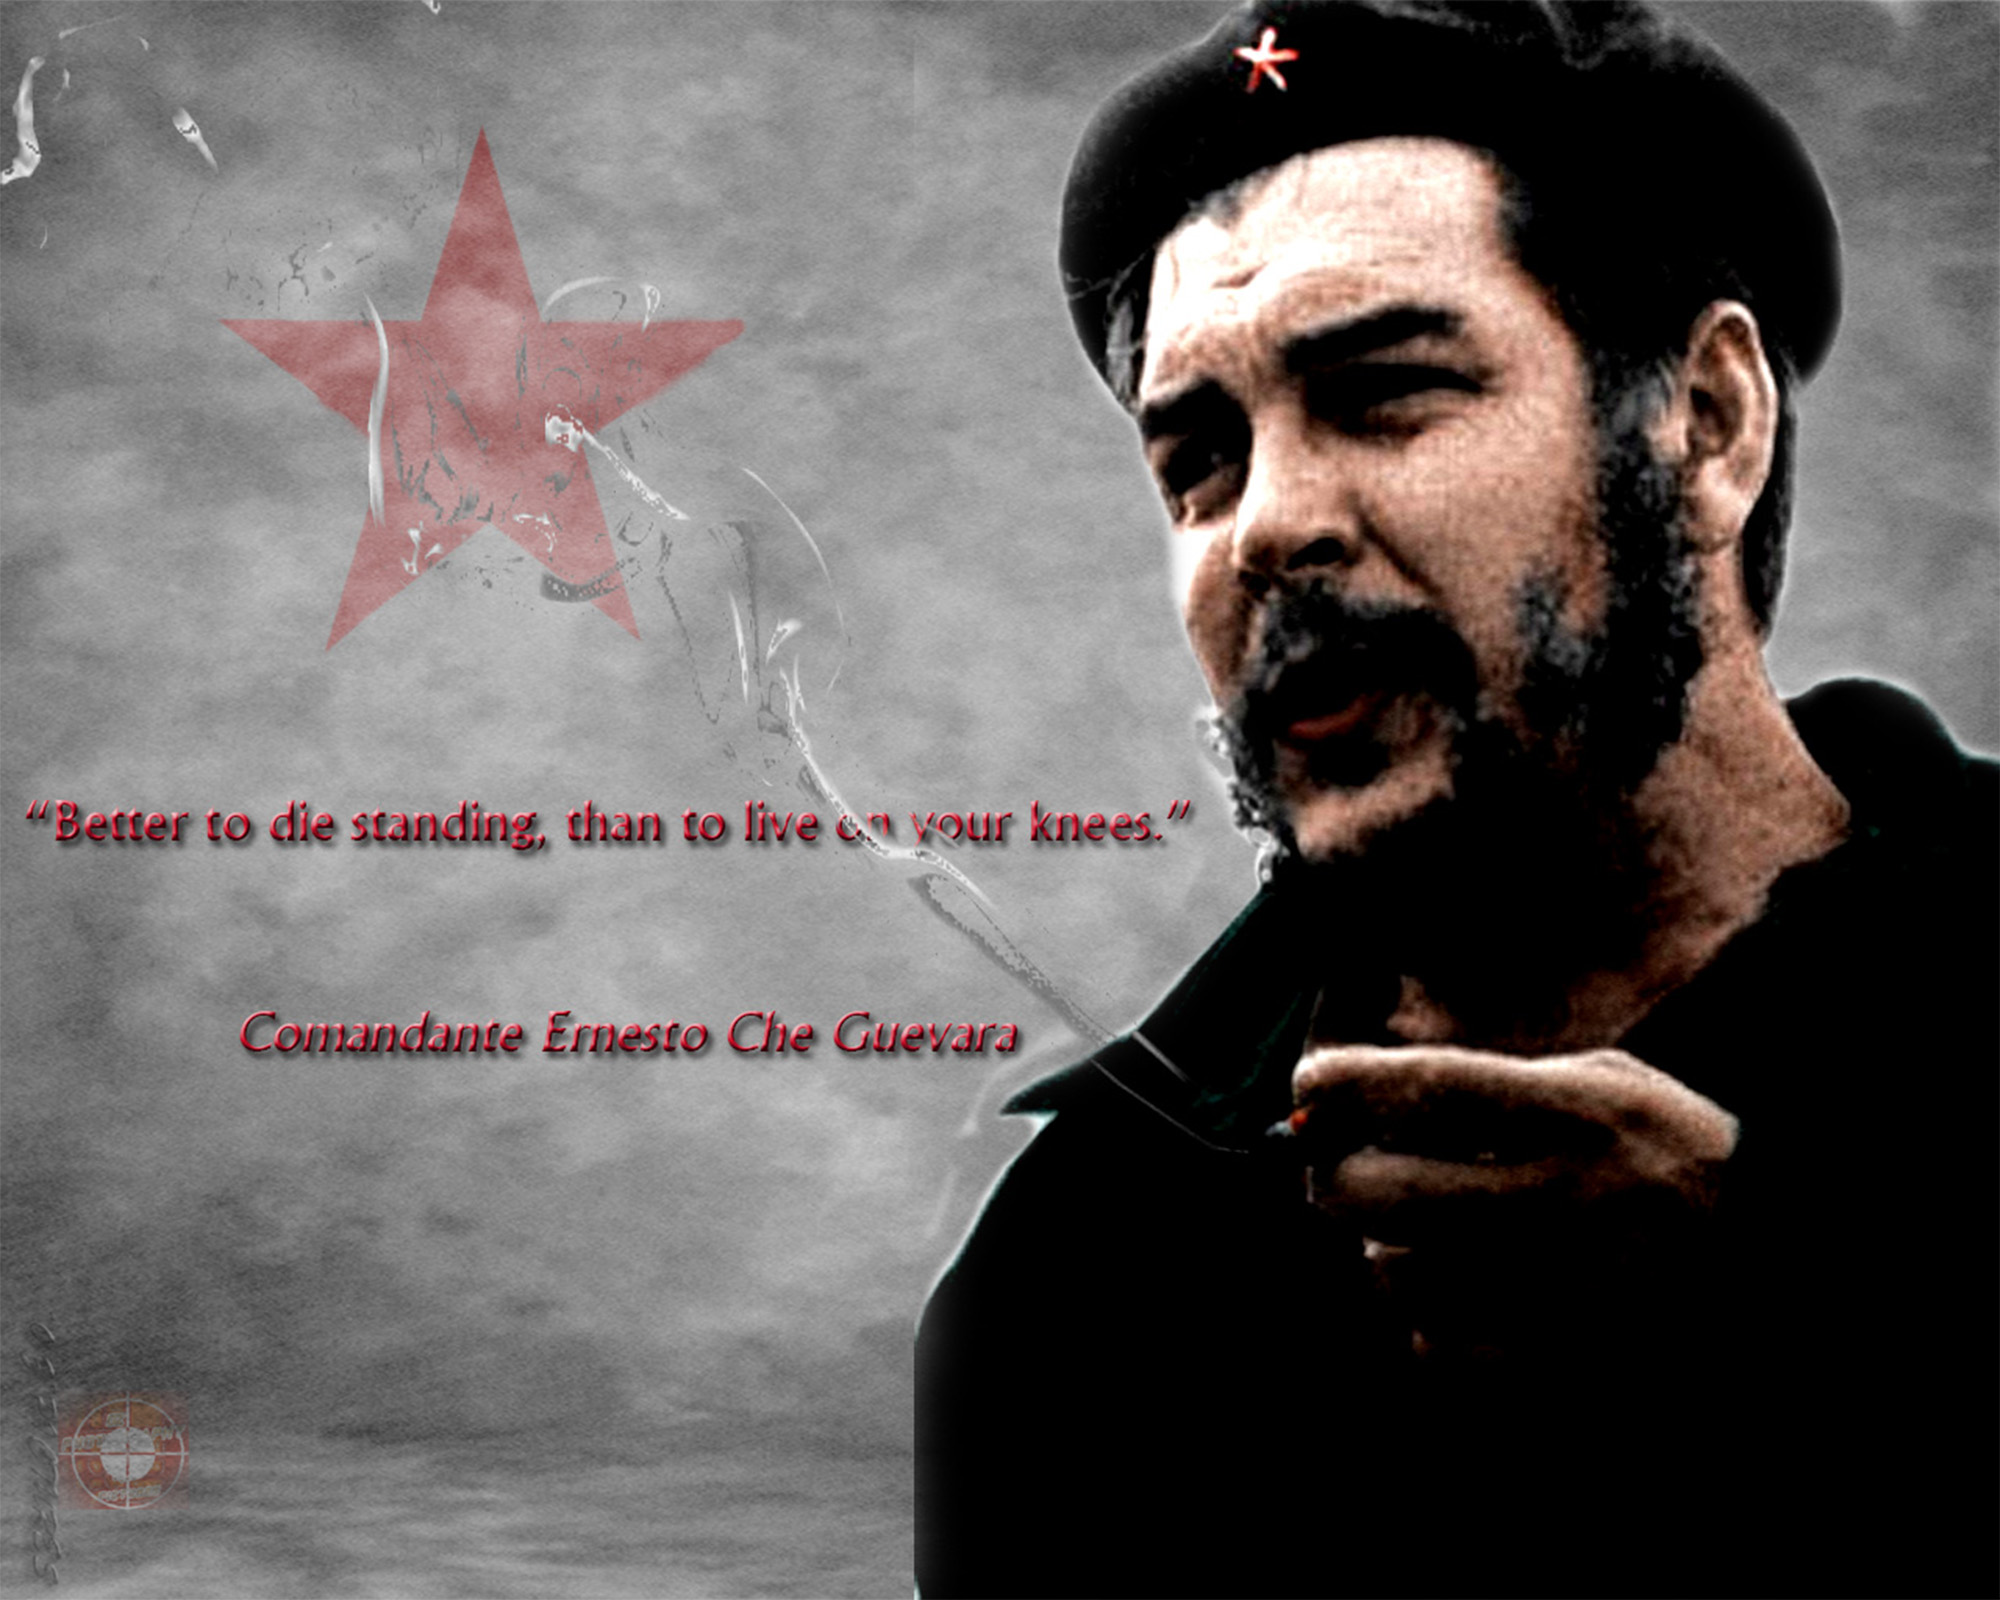 Che Guevara Wallpapers HD 2000x1600